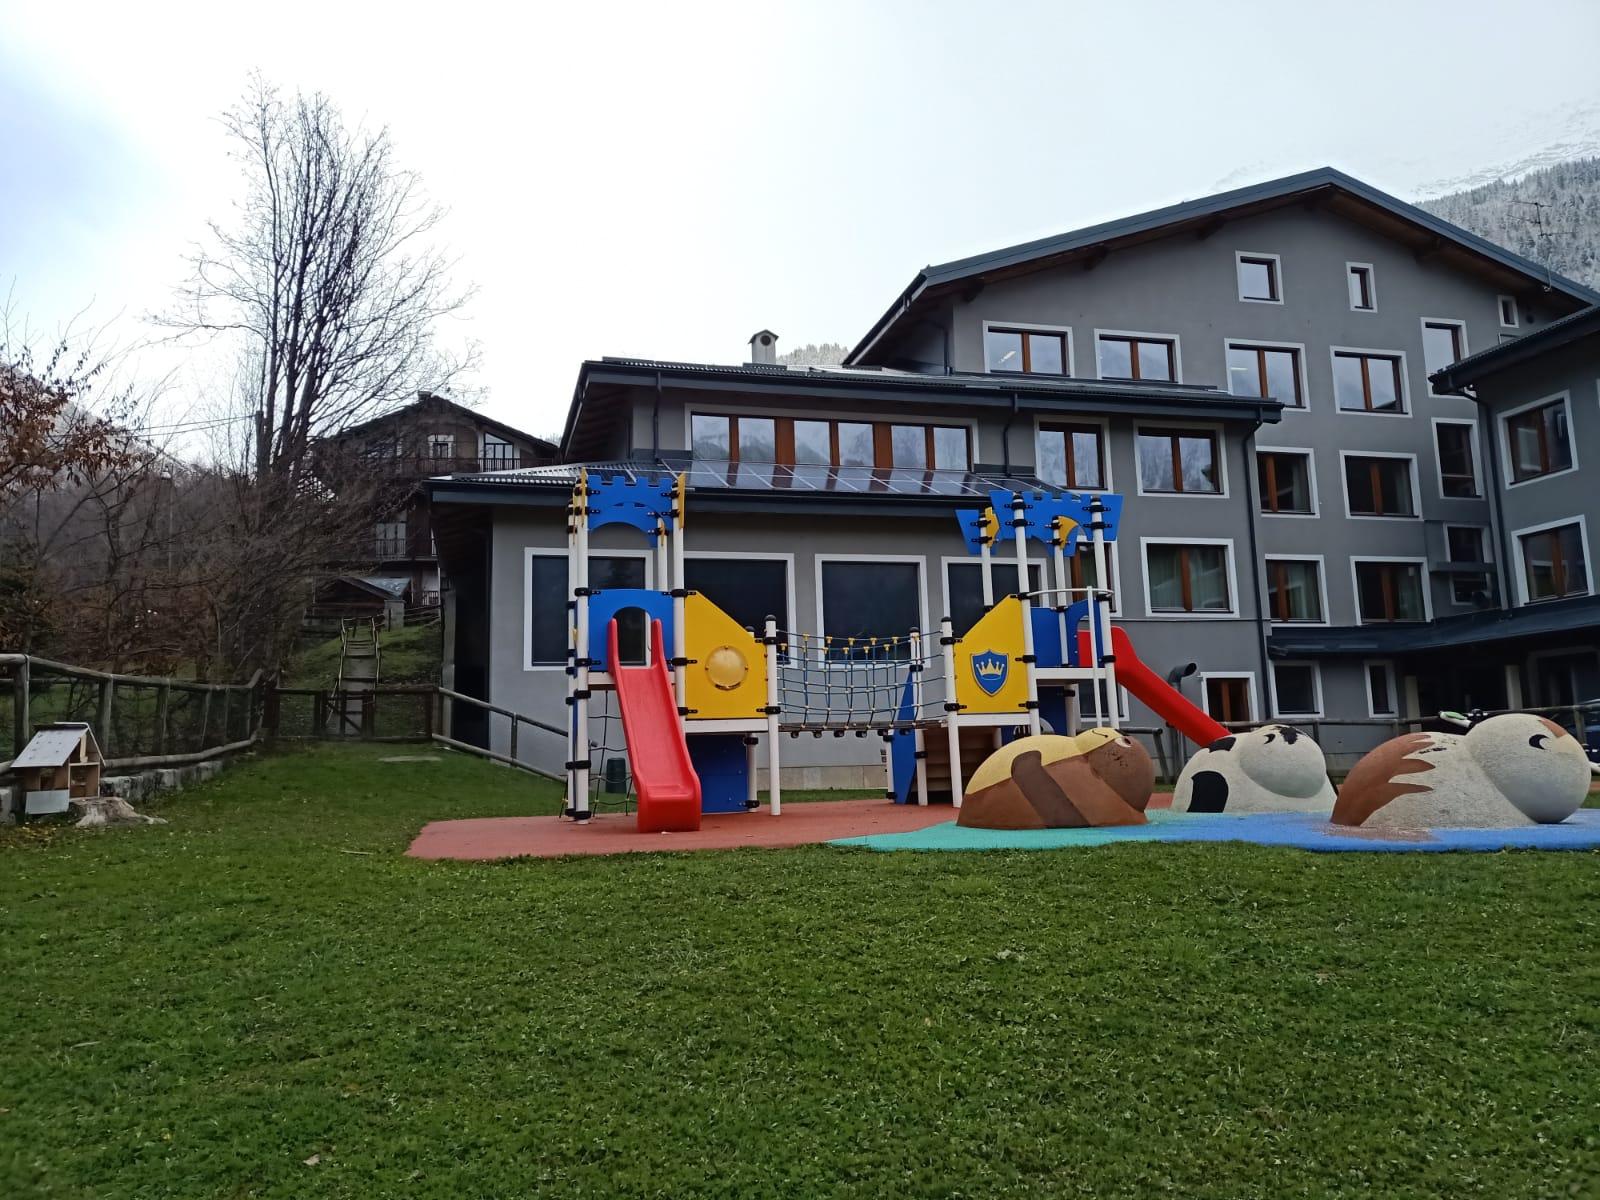 scuola regionale infanzia courmayeur